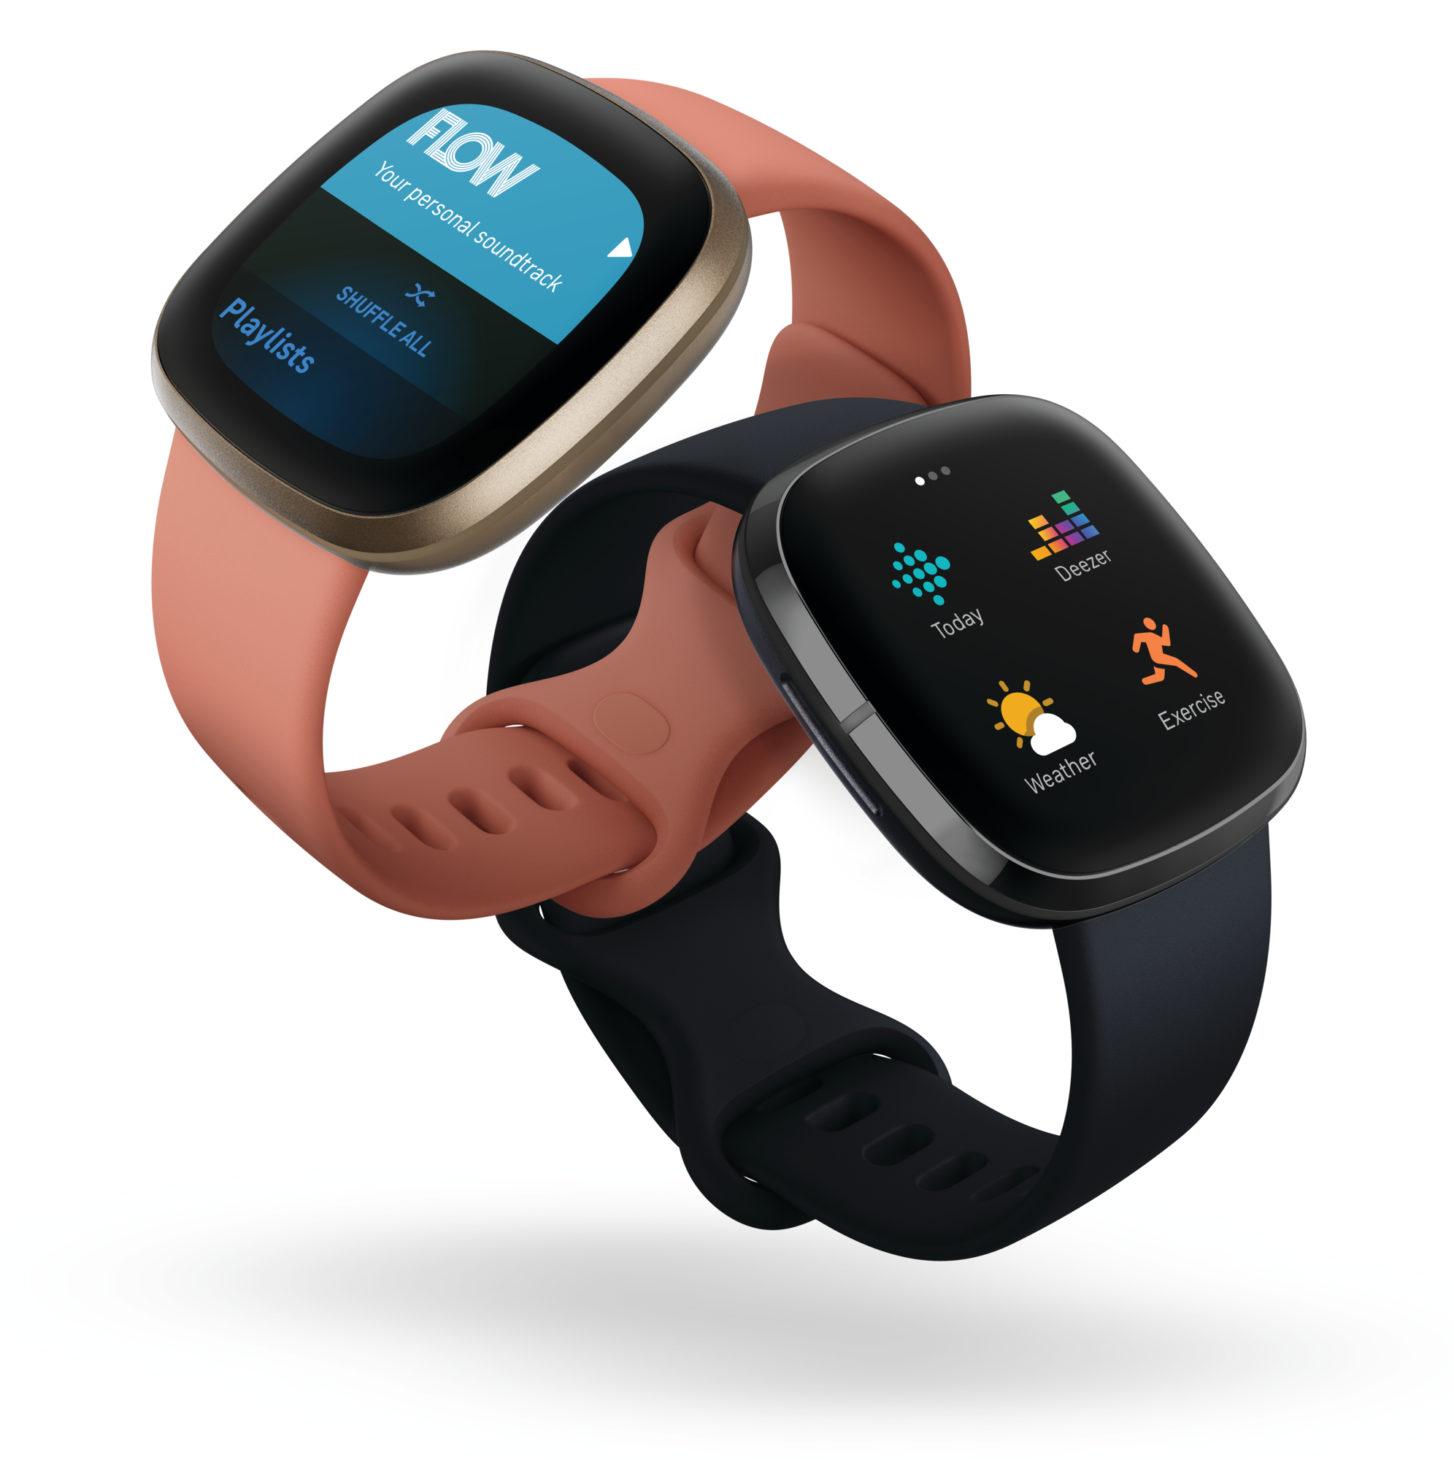 Fitbitの新作スマートウォッチ『Fitbit Sense』『Fitbit Versa 3』『Fitbit Inspire 2』が10月2日から発売開始。販売店の情報も紹介